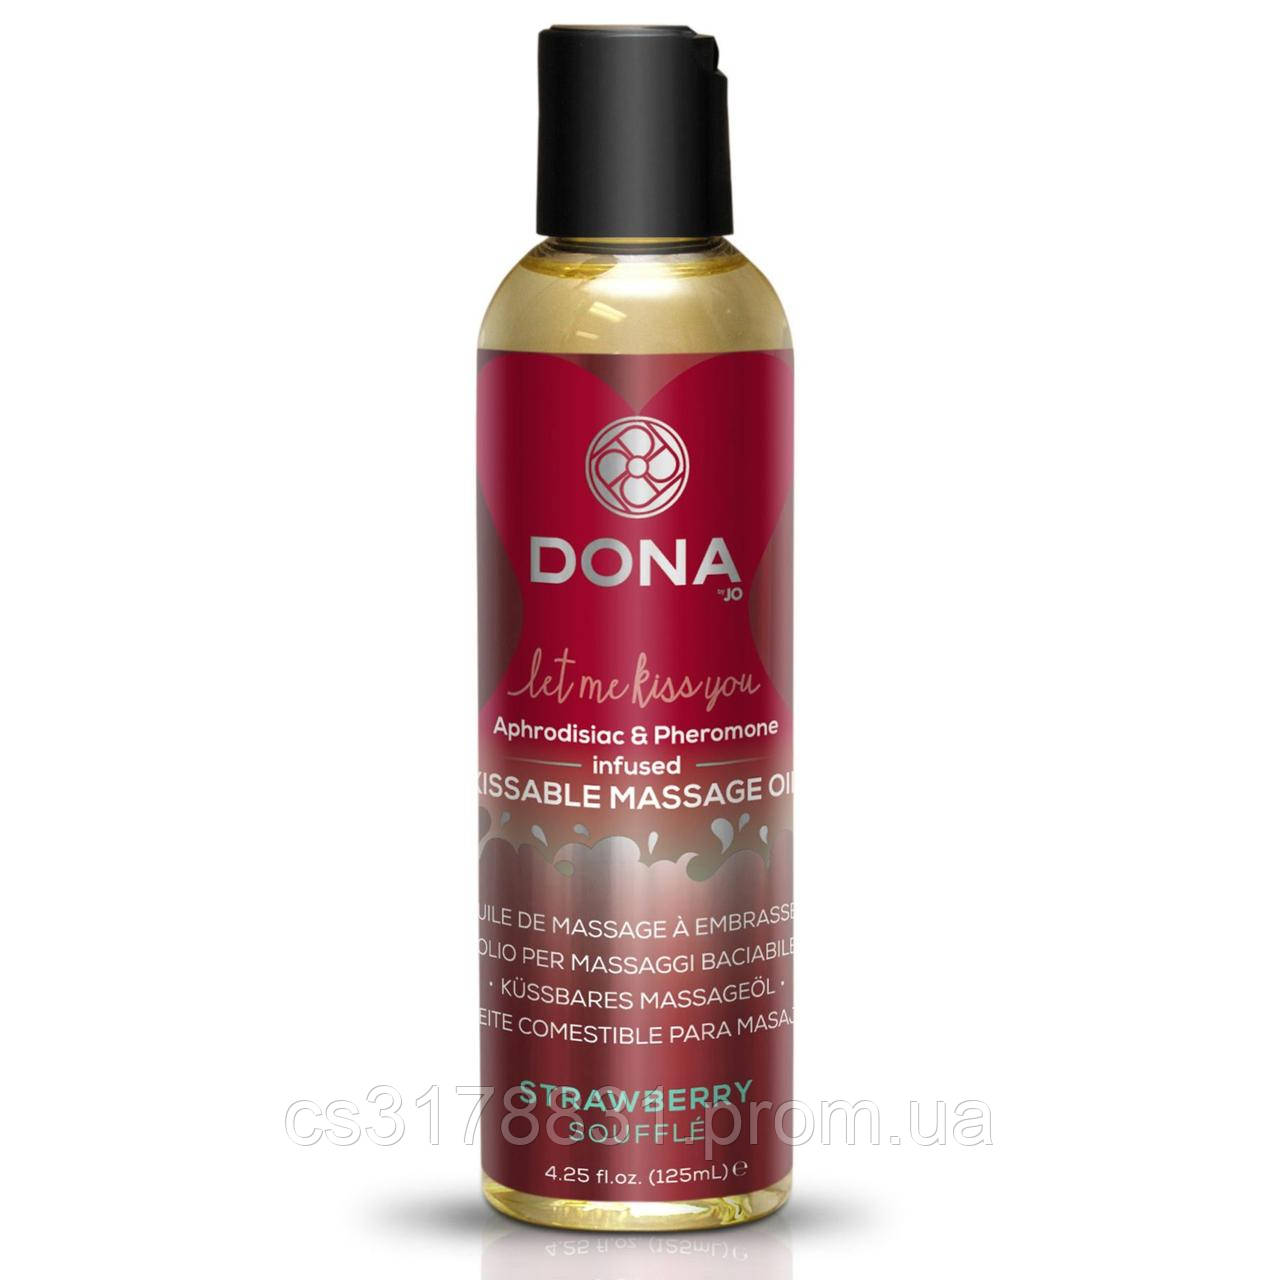 Массажное масло DONA Kissable Massage Oil Strawberry Souffle (110 мл)